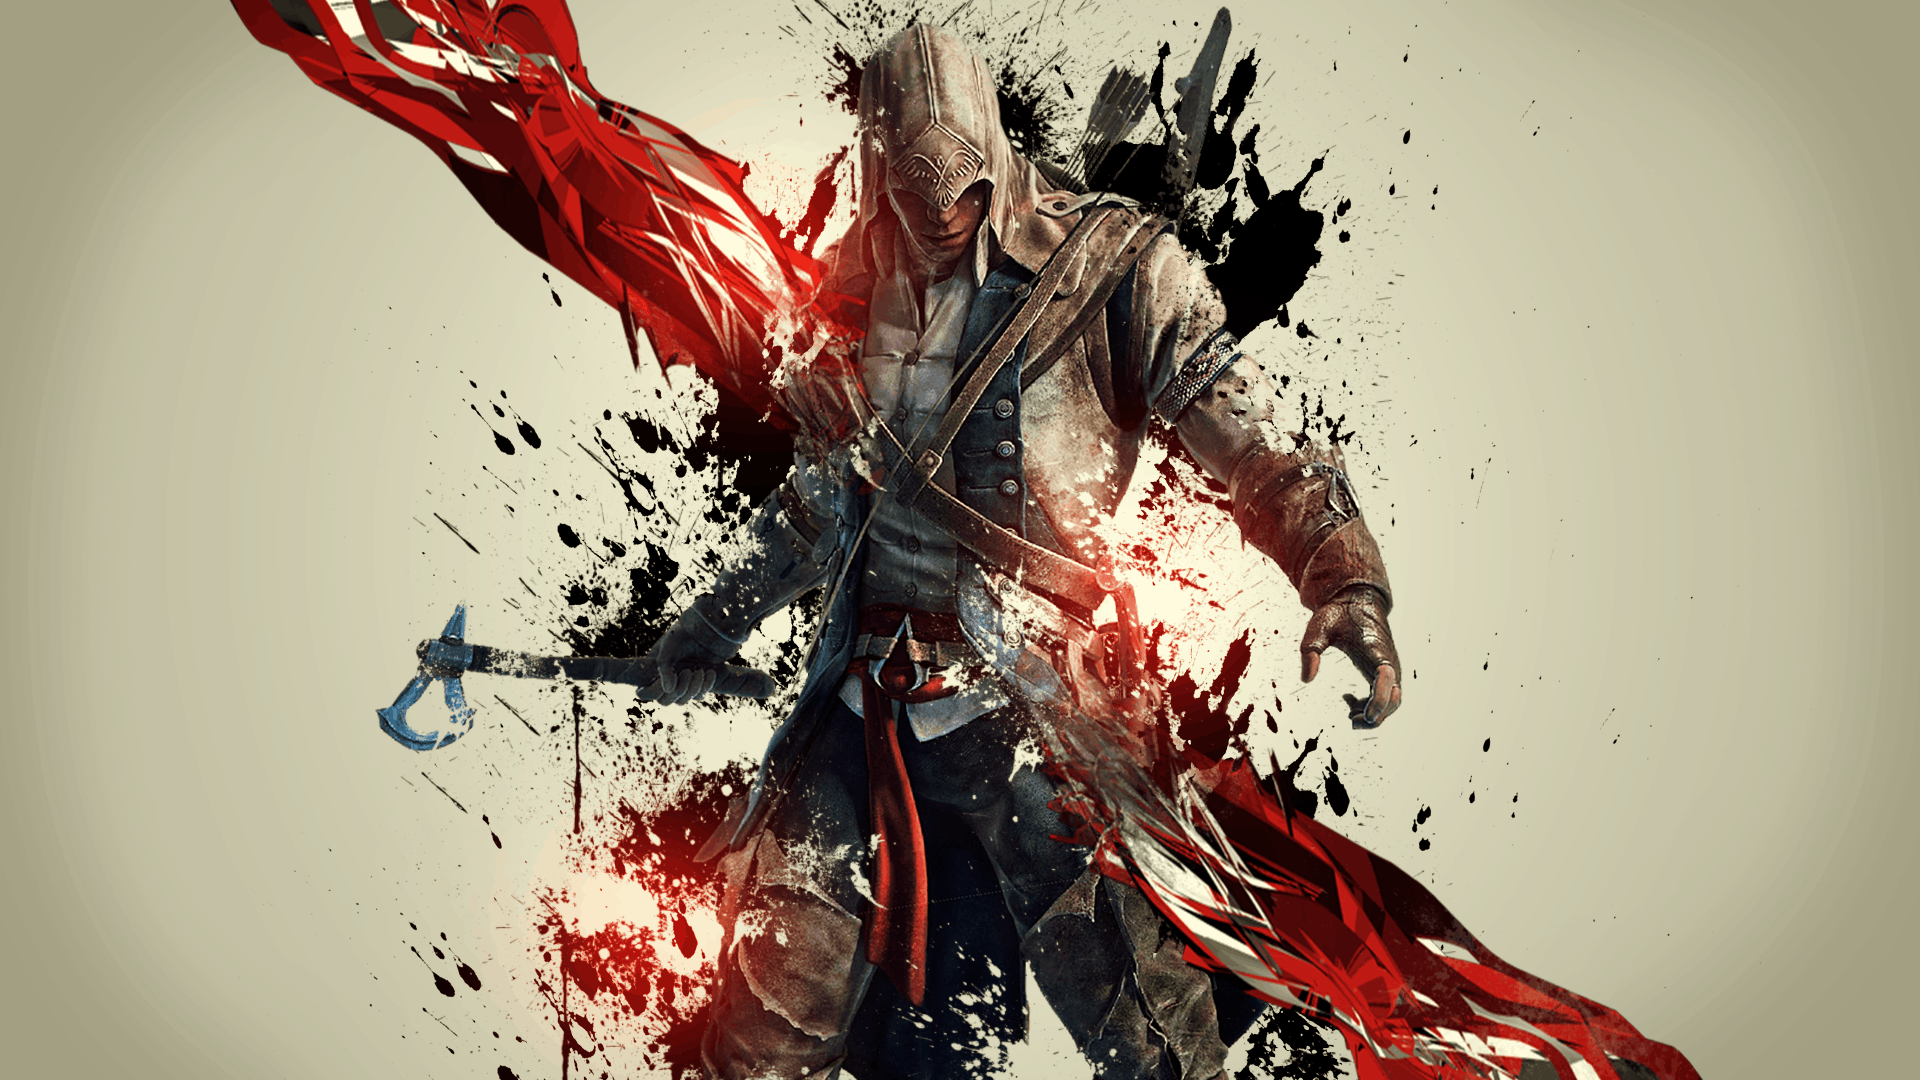 Assain Creed Video Game Wallpaper 034